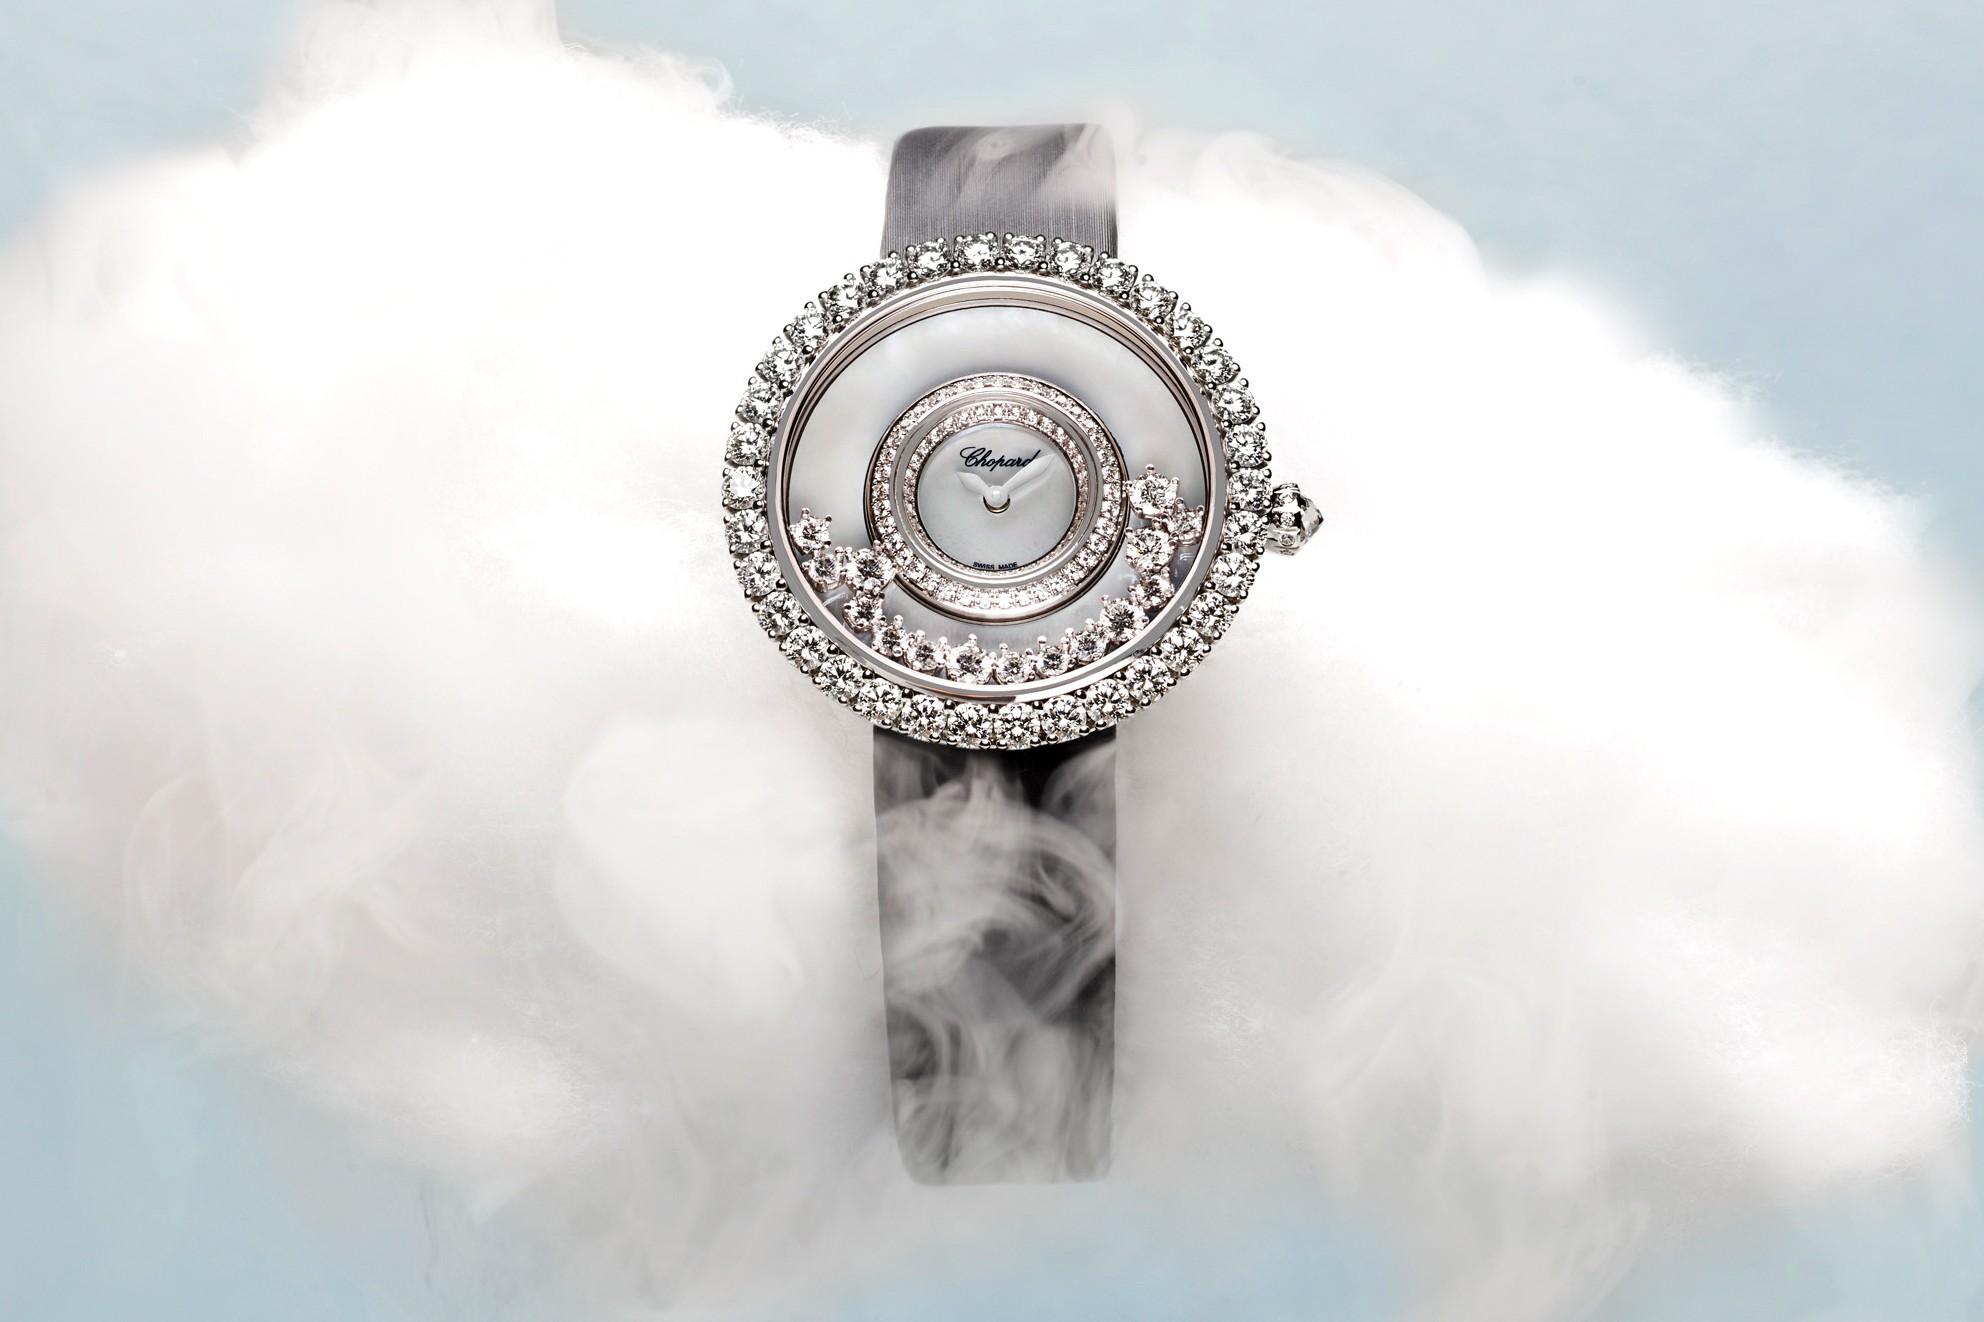 Chopard celebrates 40 years of Happy Diamonds